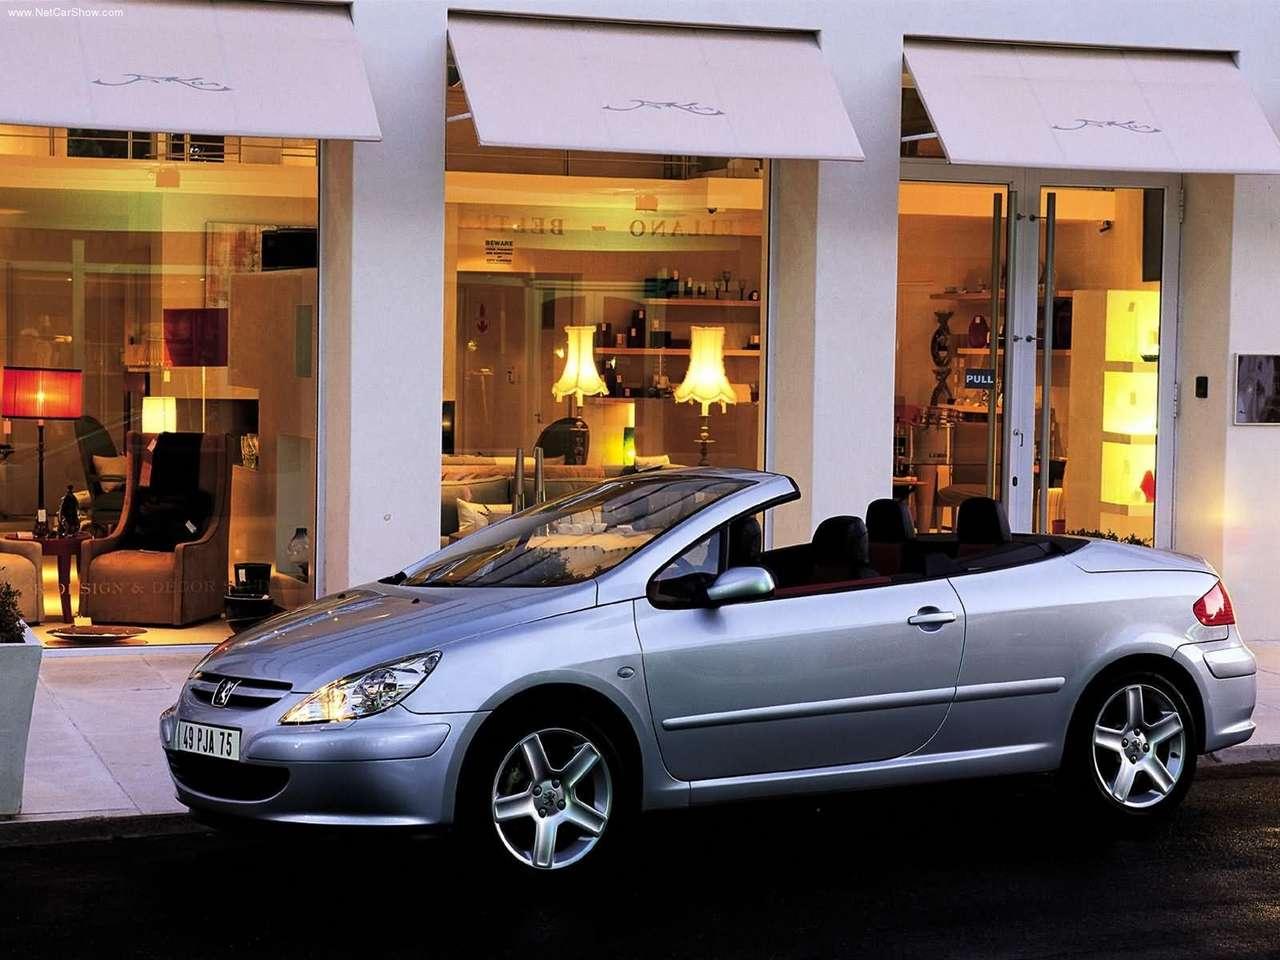 http://1.bp.blogspot.com/_xhqjRo6NERQ/S8nLrrDXYSI/AAAAAAAAIXw/TZ3eE2KuIus/s1600/Peugeot-307_CC_2003_1280x960_wallpaper_05.jpg